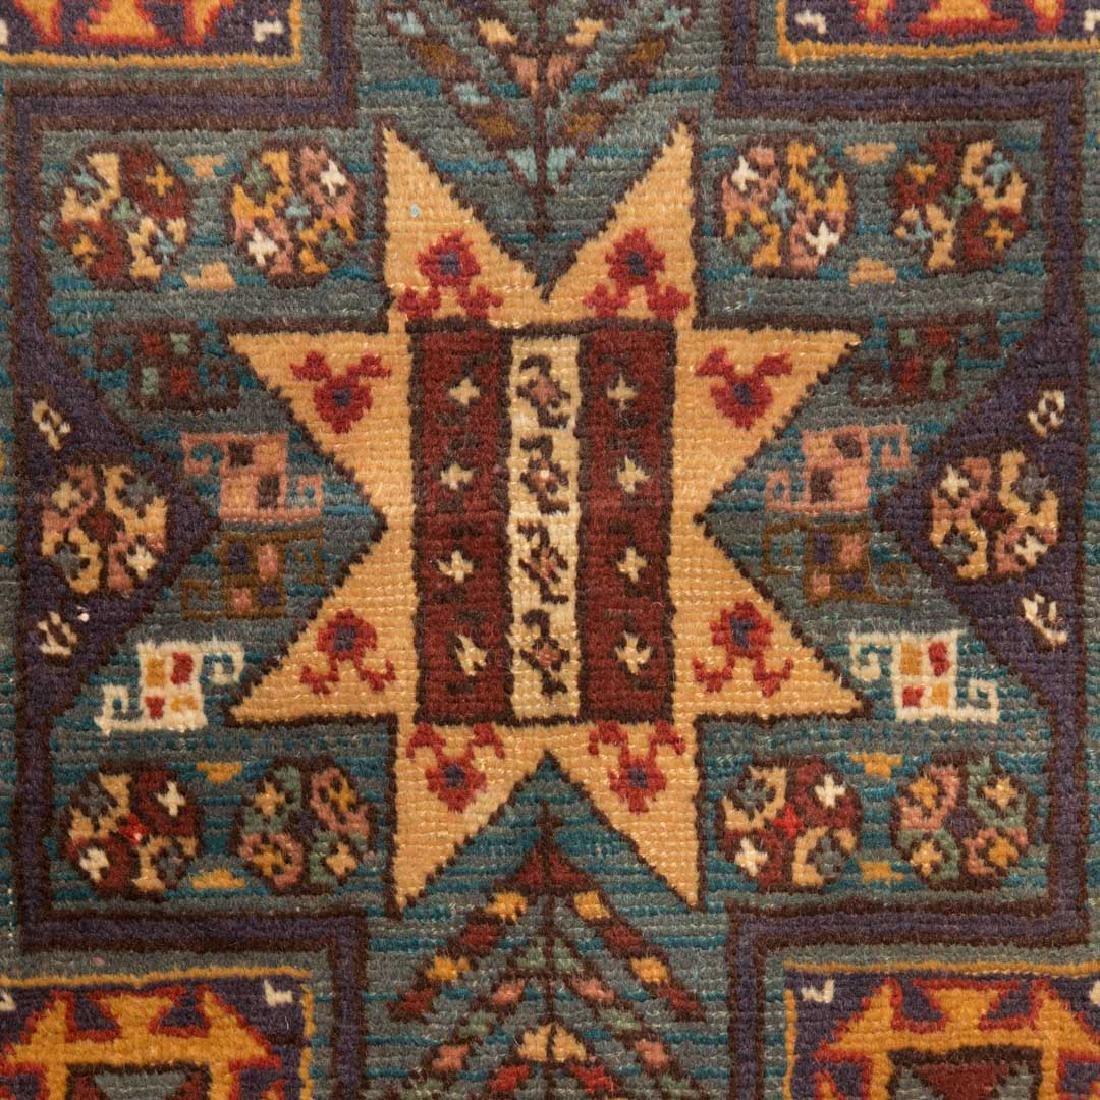 Antique Kazak rug, approx. 3.4 x 8.4 - 4